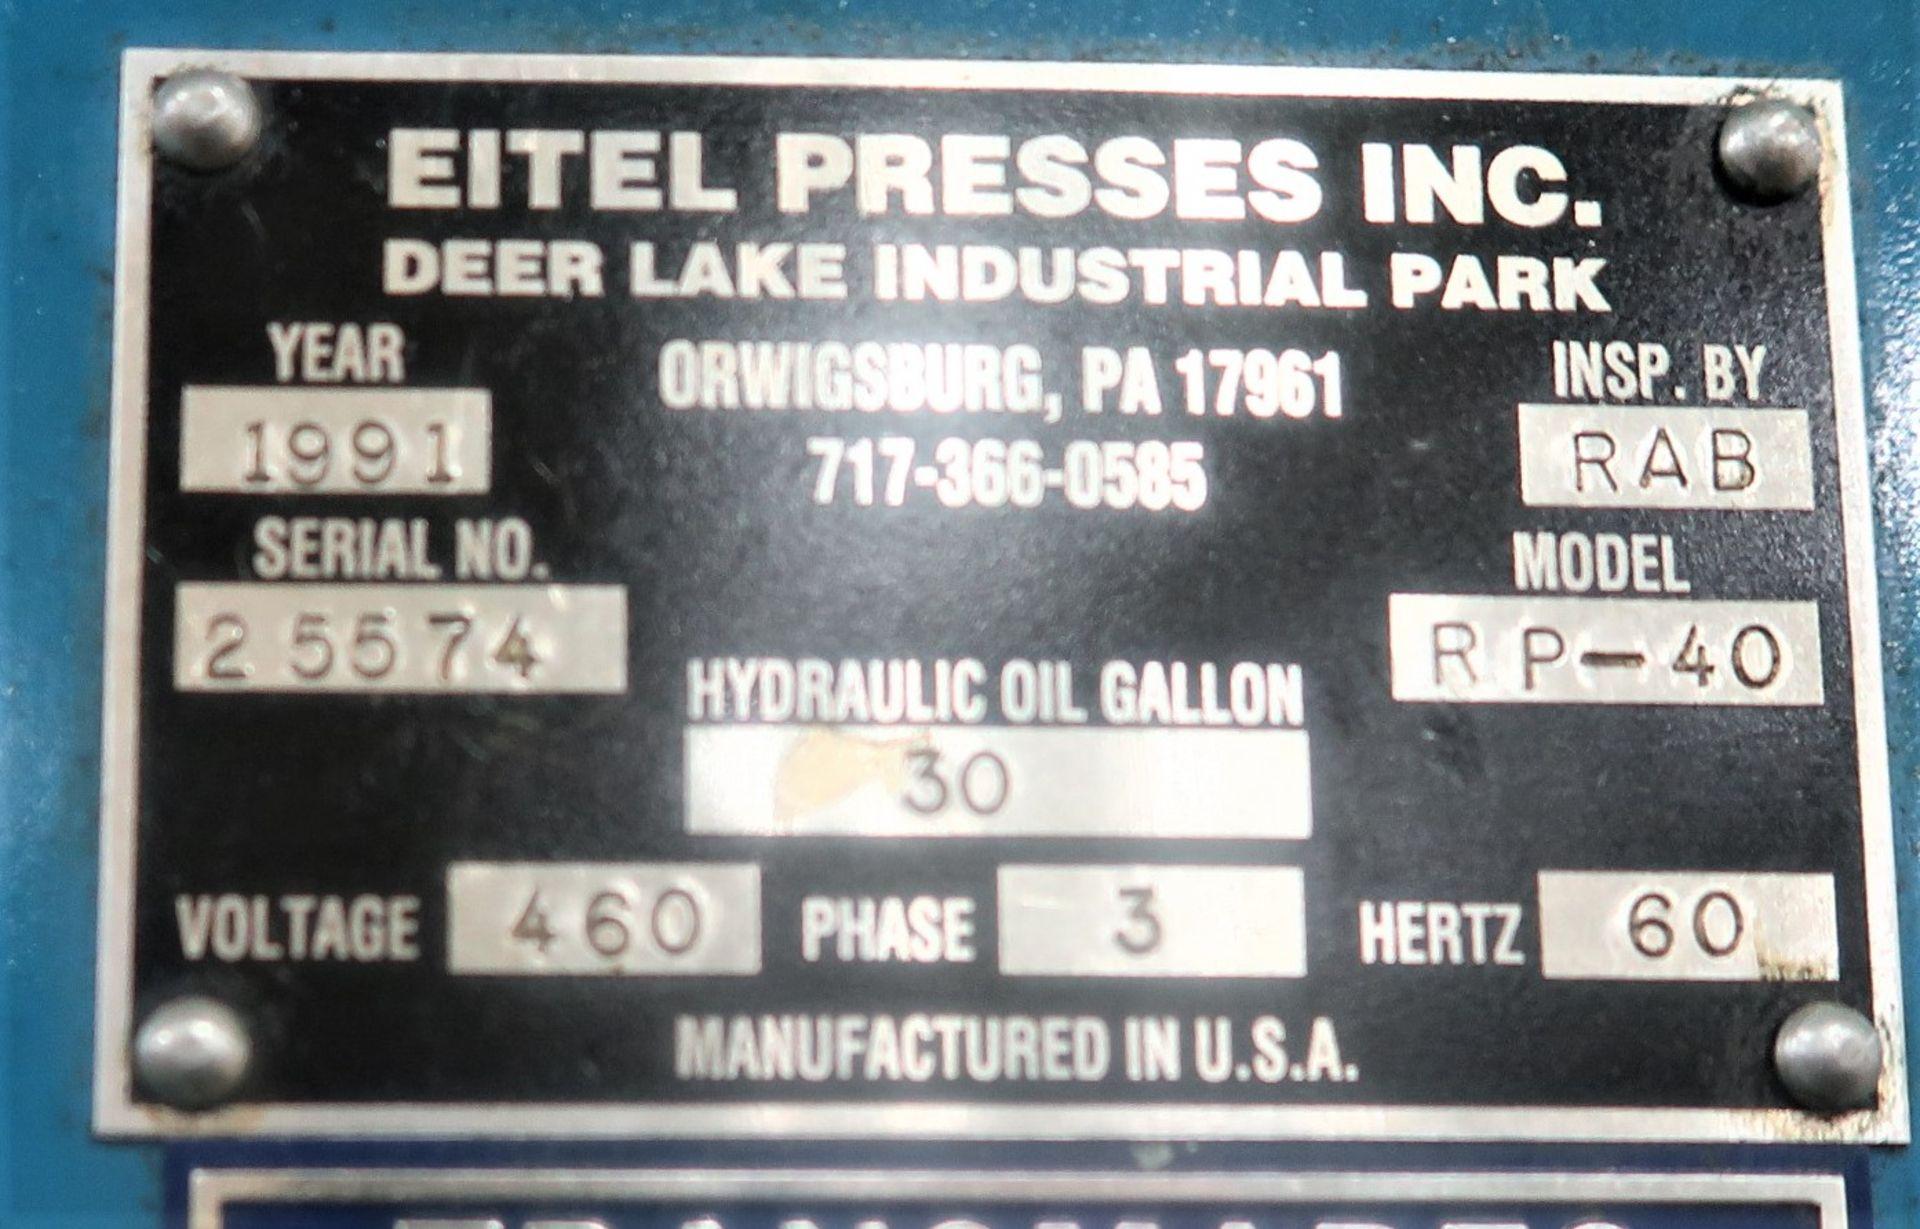 Lot 27 - 40 Ton Eitel Model RP-40 Precision Hydraulic Straightening Press, S/N 25574